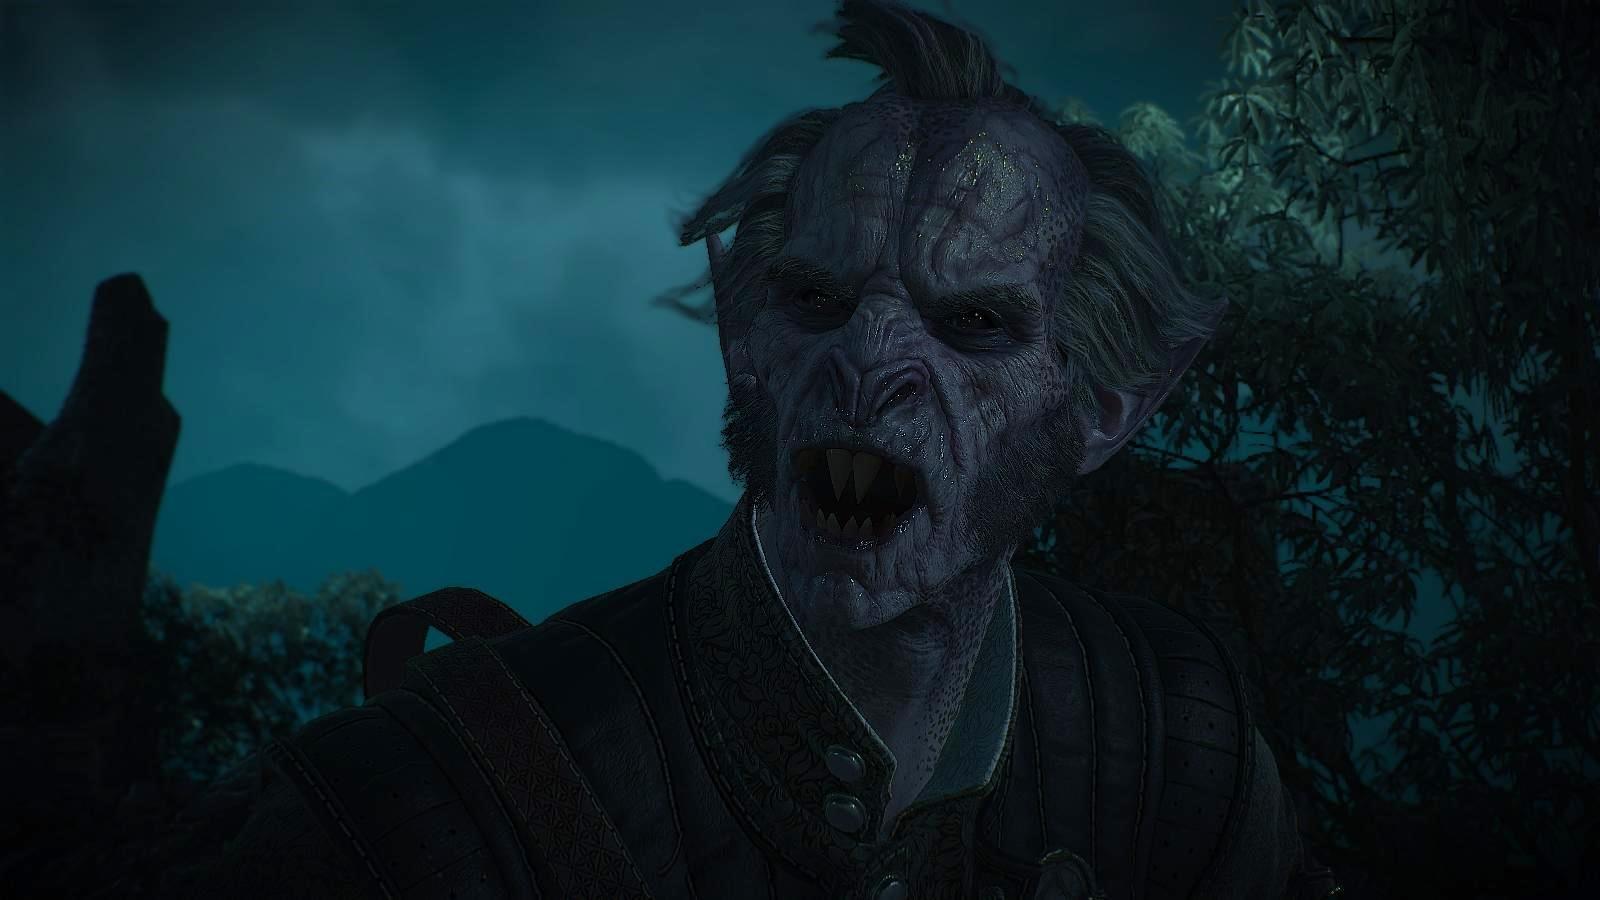 Регис. Ведьмак III (сборка Торна)